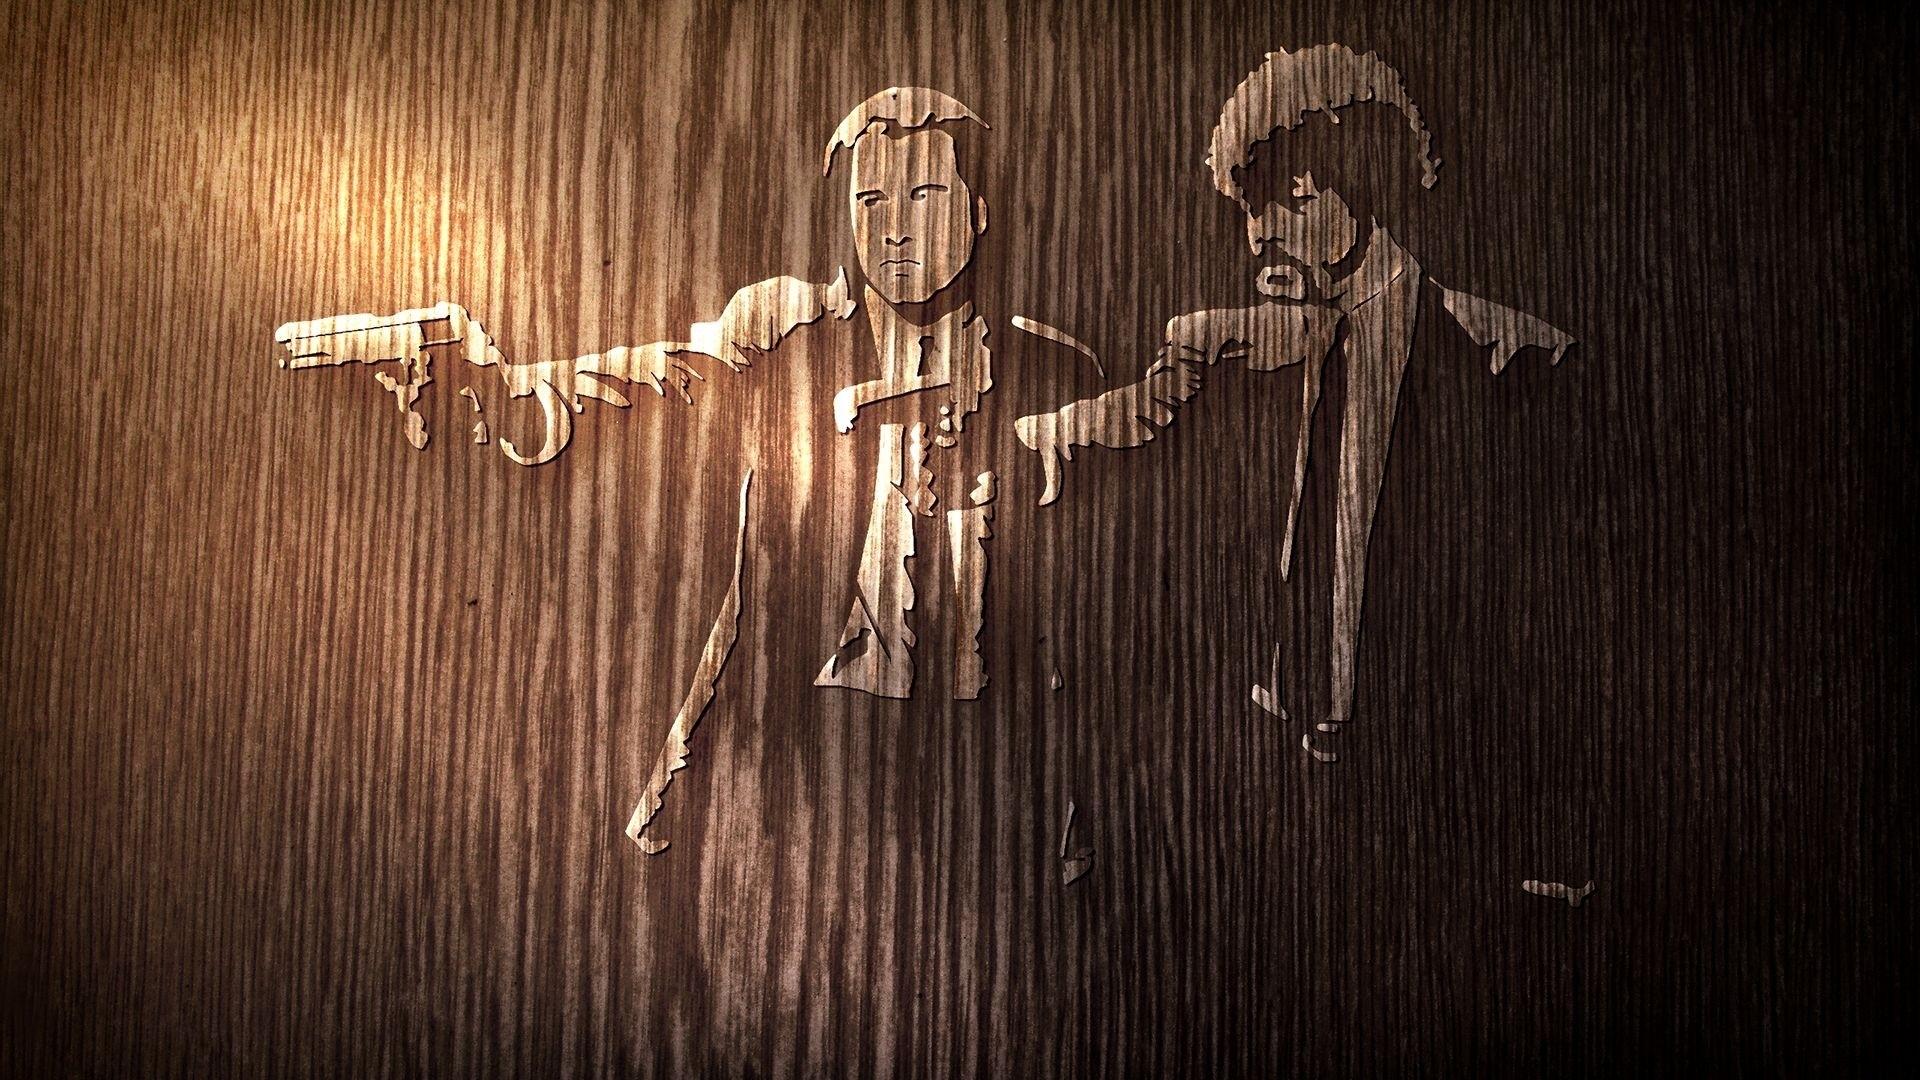 Wallpaper pulp fiction, tree, actors, john travolta, samuel  jackson, gun